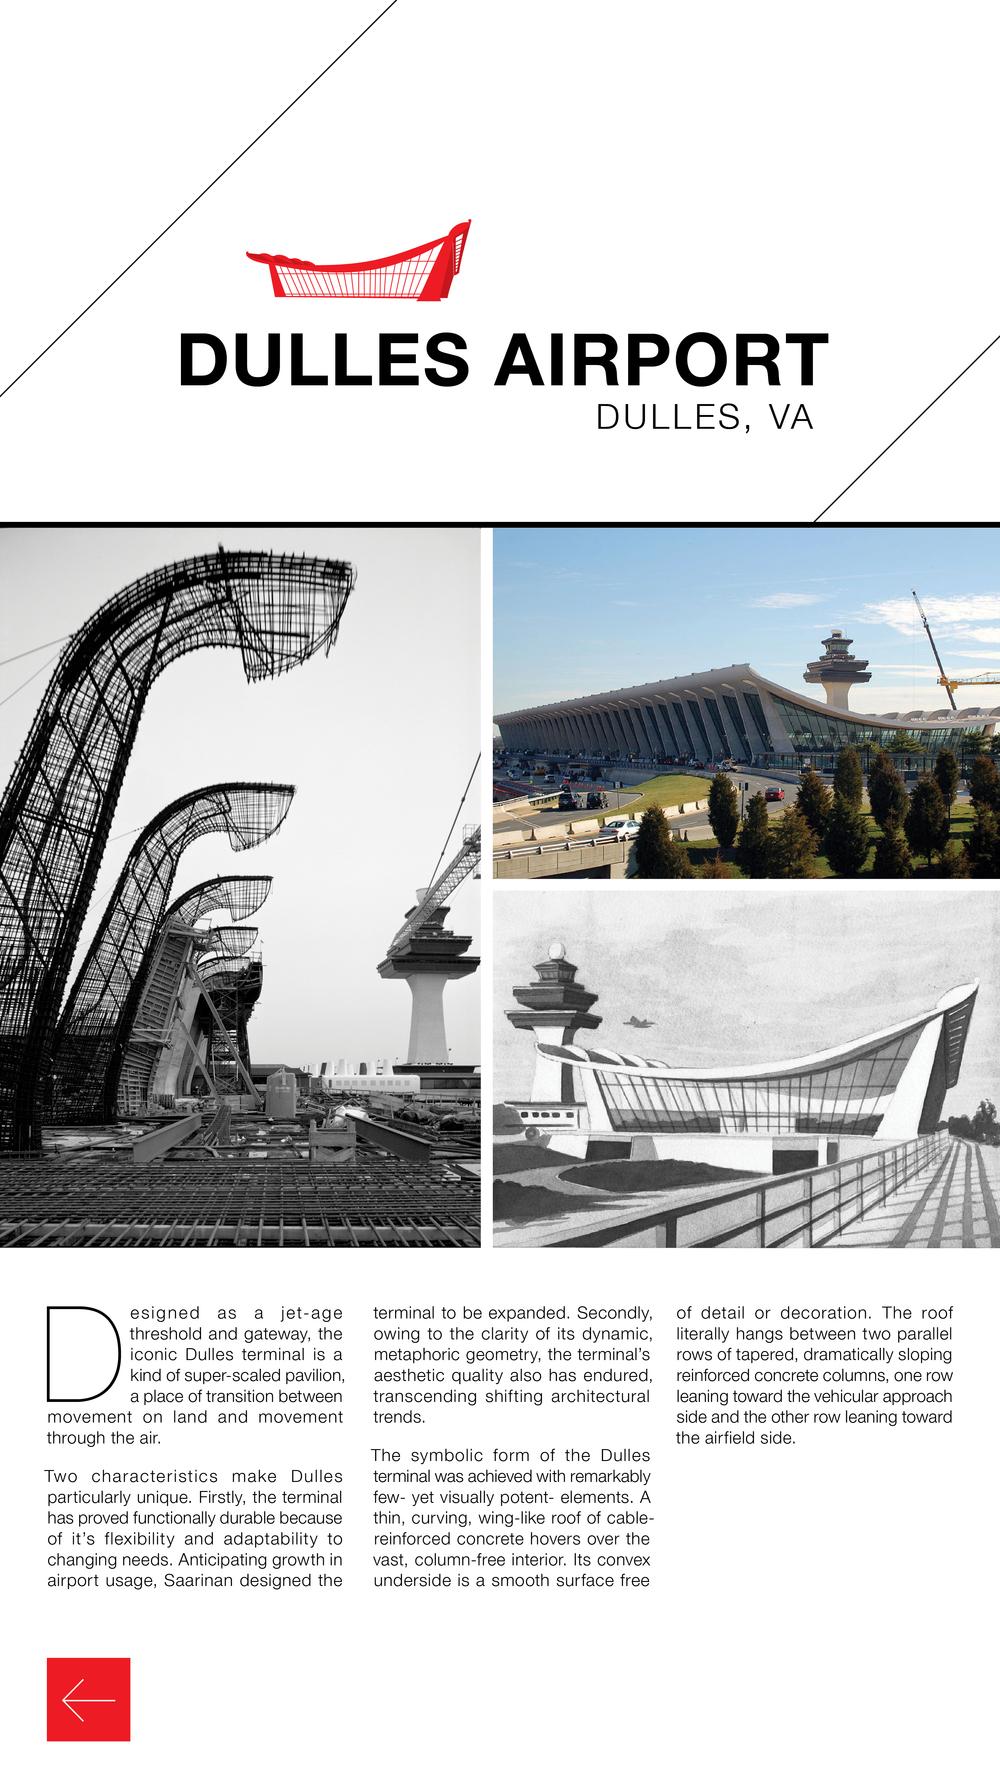 6_Pillars9.jpg